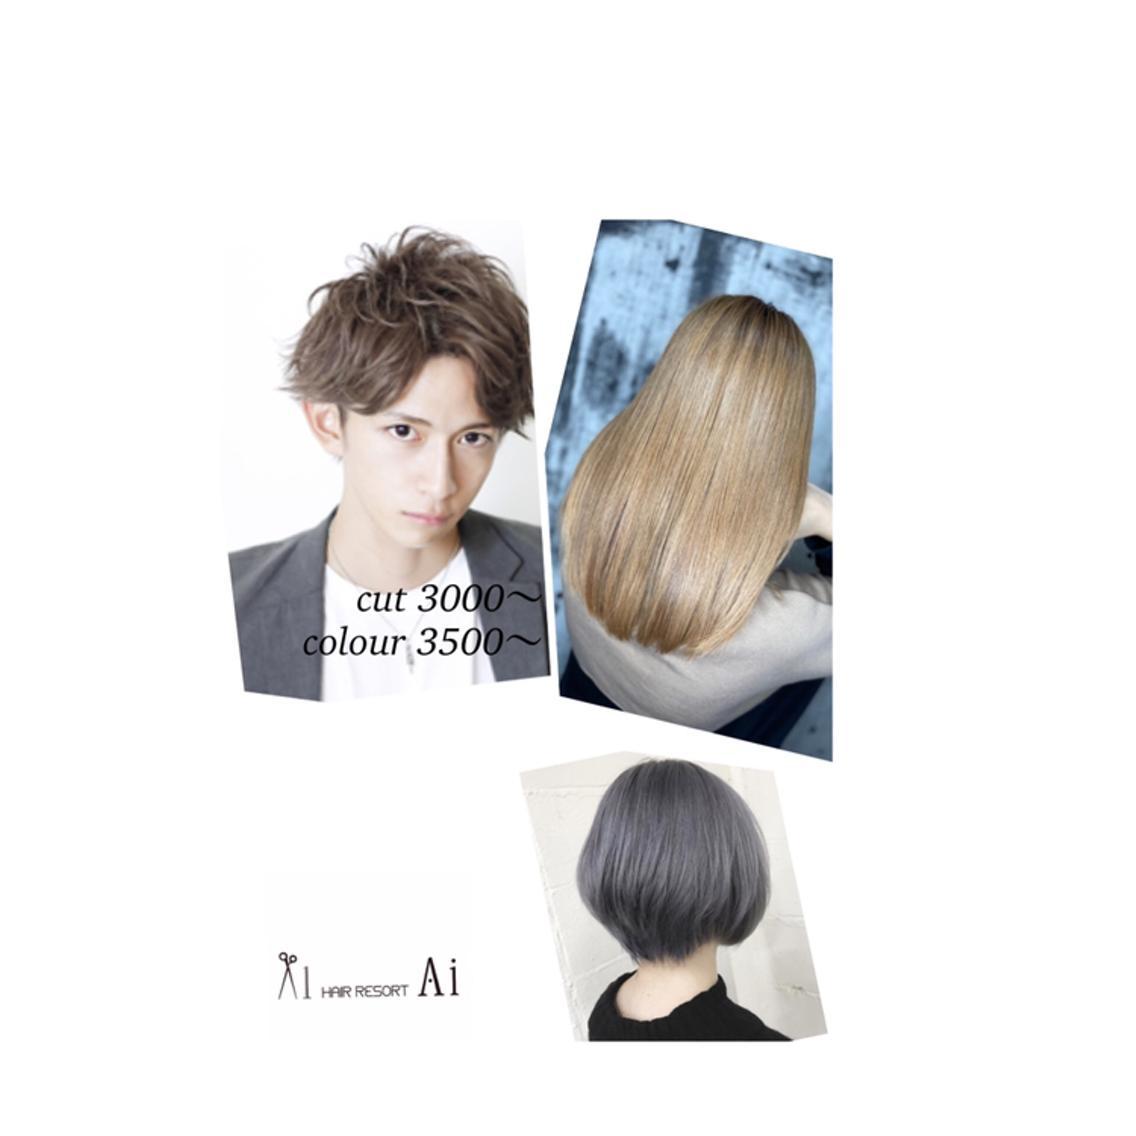 hair resort Ai 新宿店【金曜原宿店】所属・⭕️齋藤 たつと⭕️の掲載